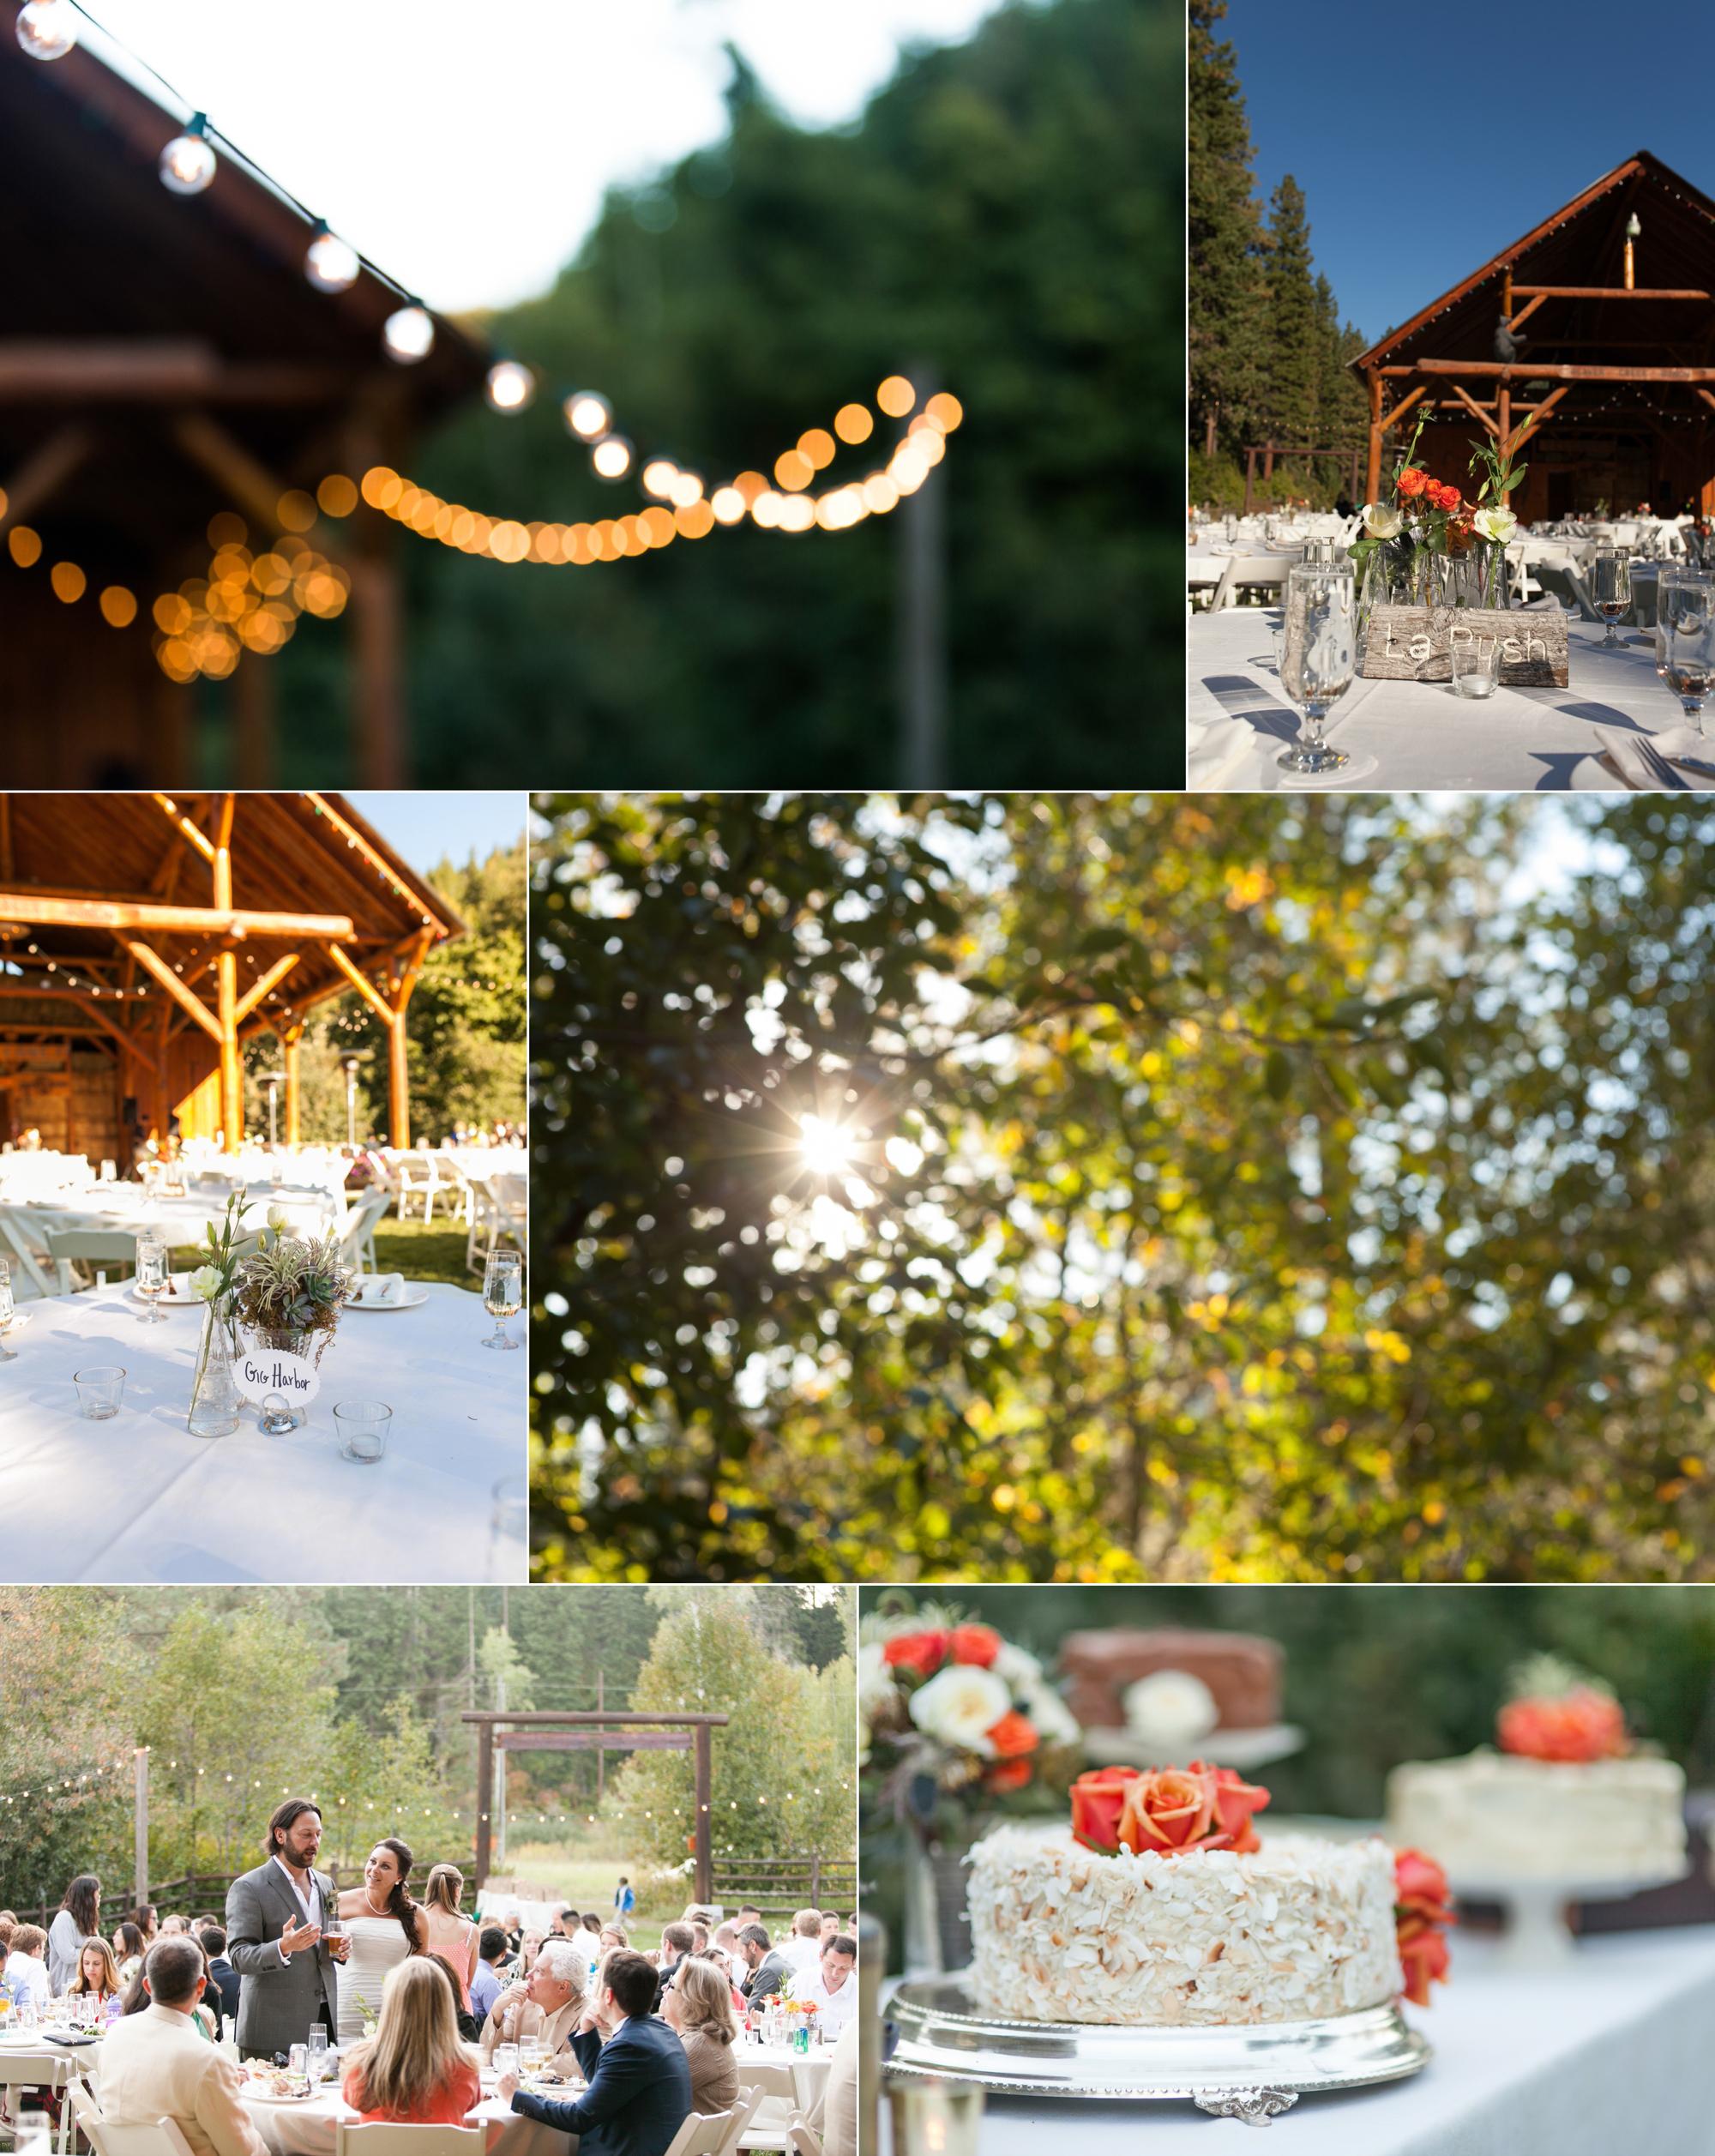 ashley vos photography seattle tacoma area wedding photographer_0825a.jpg